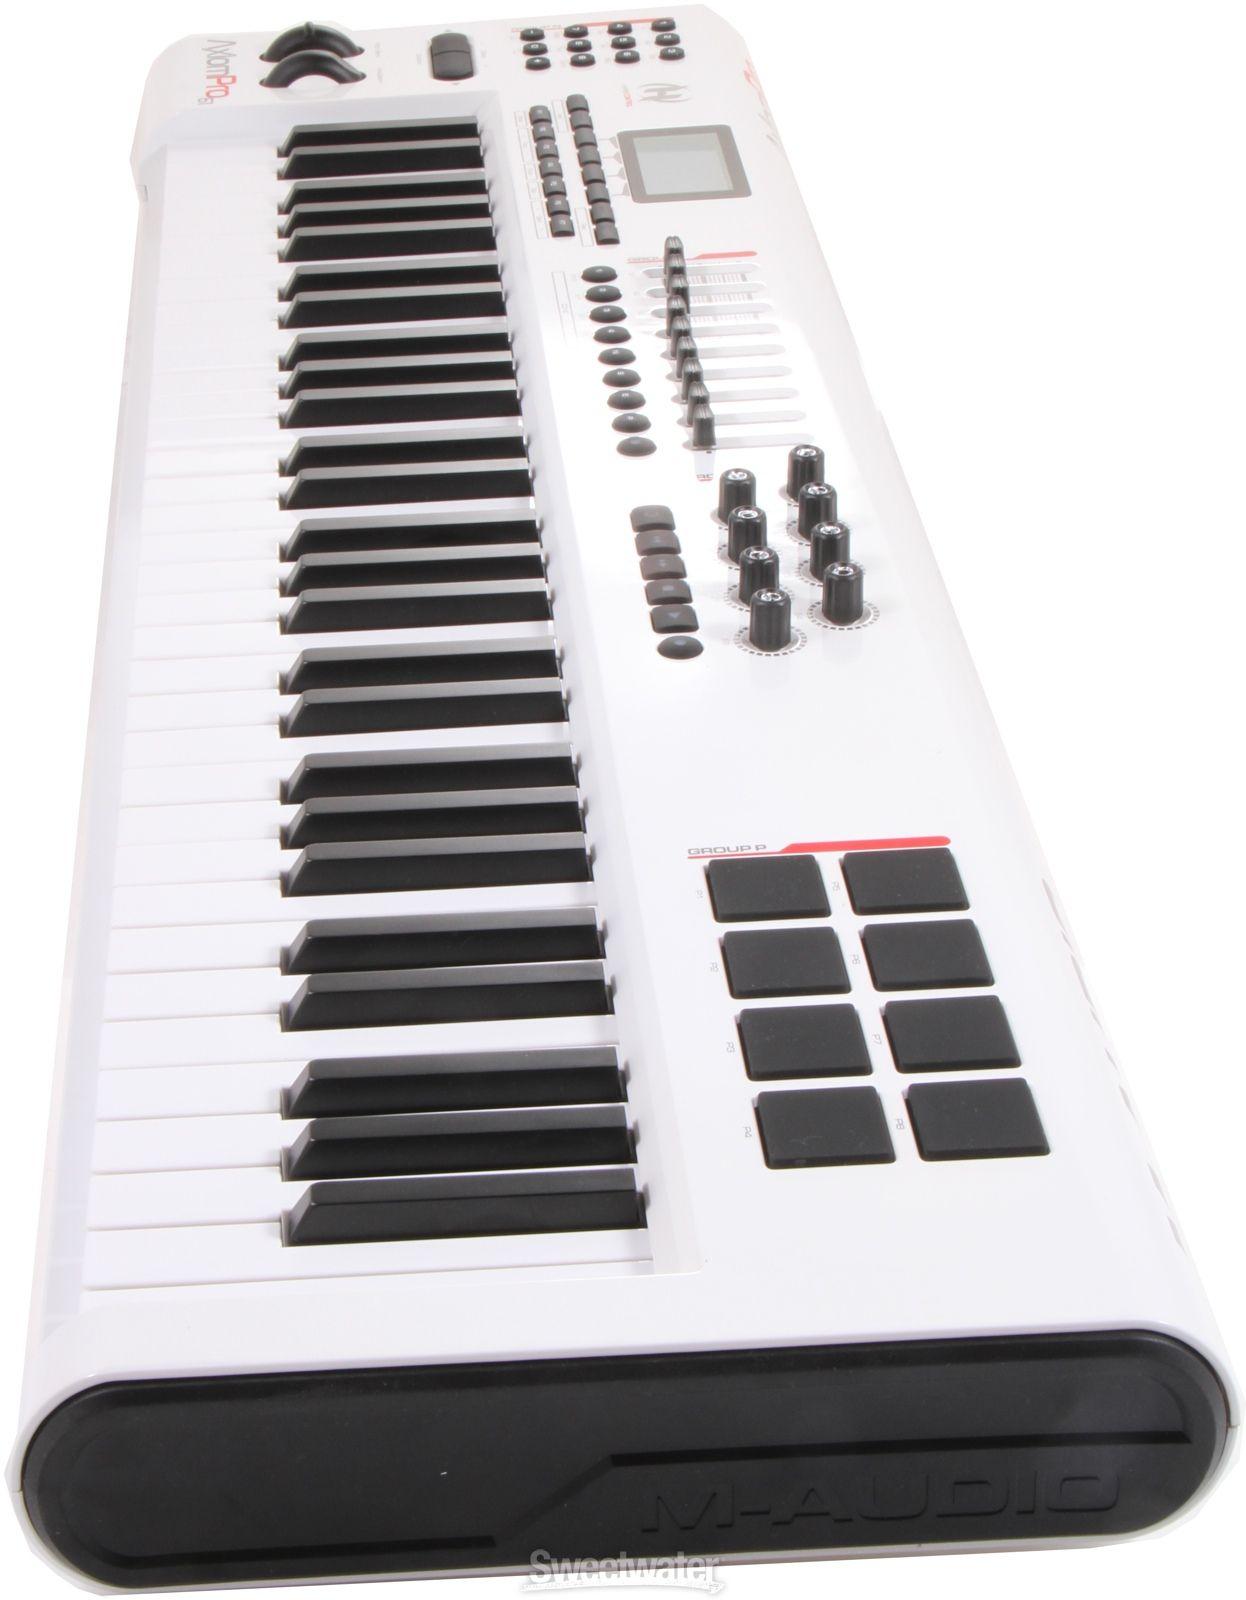 M Audio Code 61 61 Key Keyboard Controller M Audio Keyboard 61